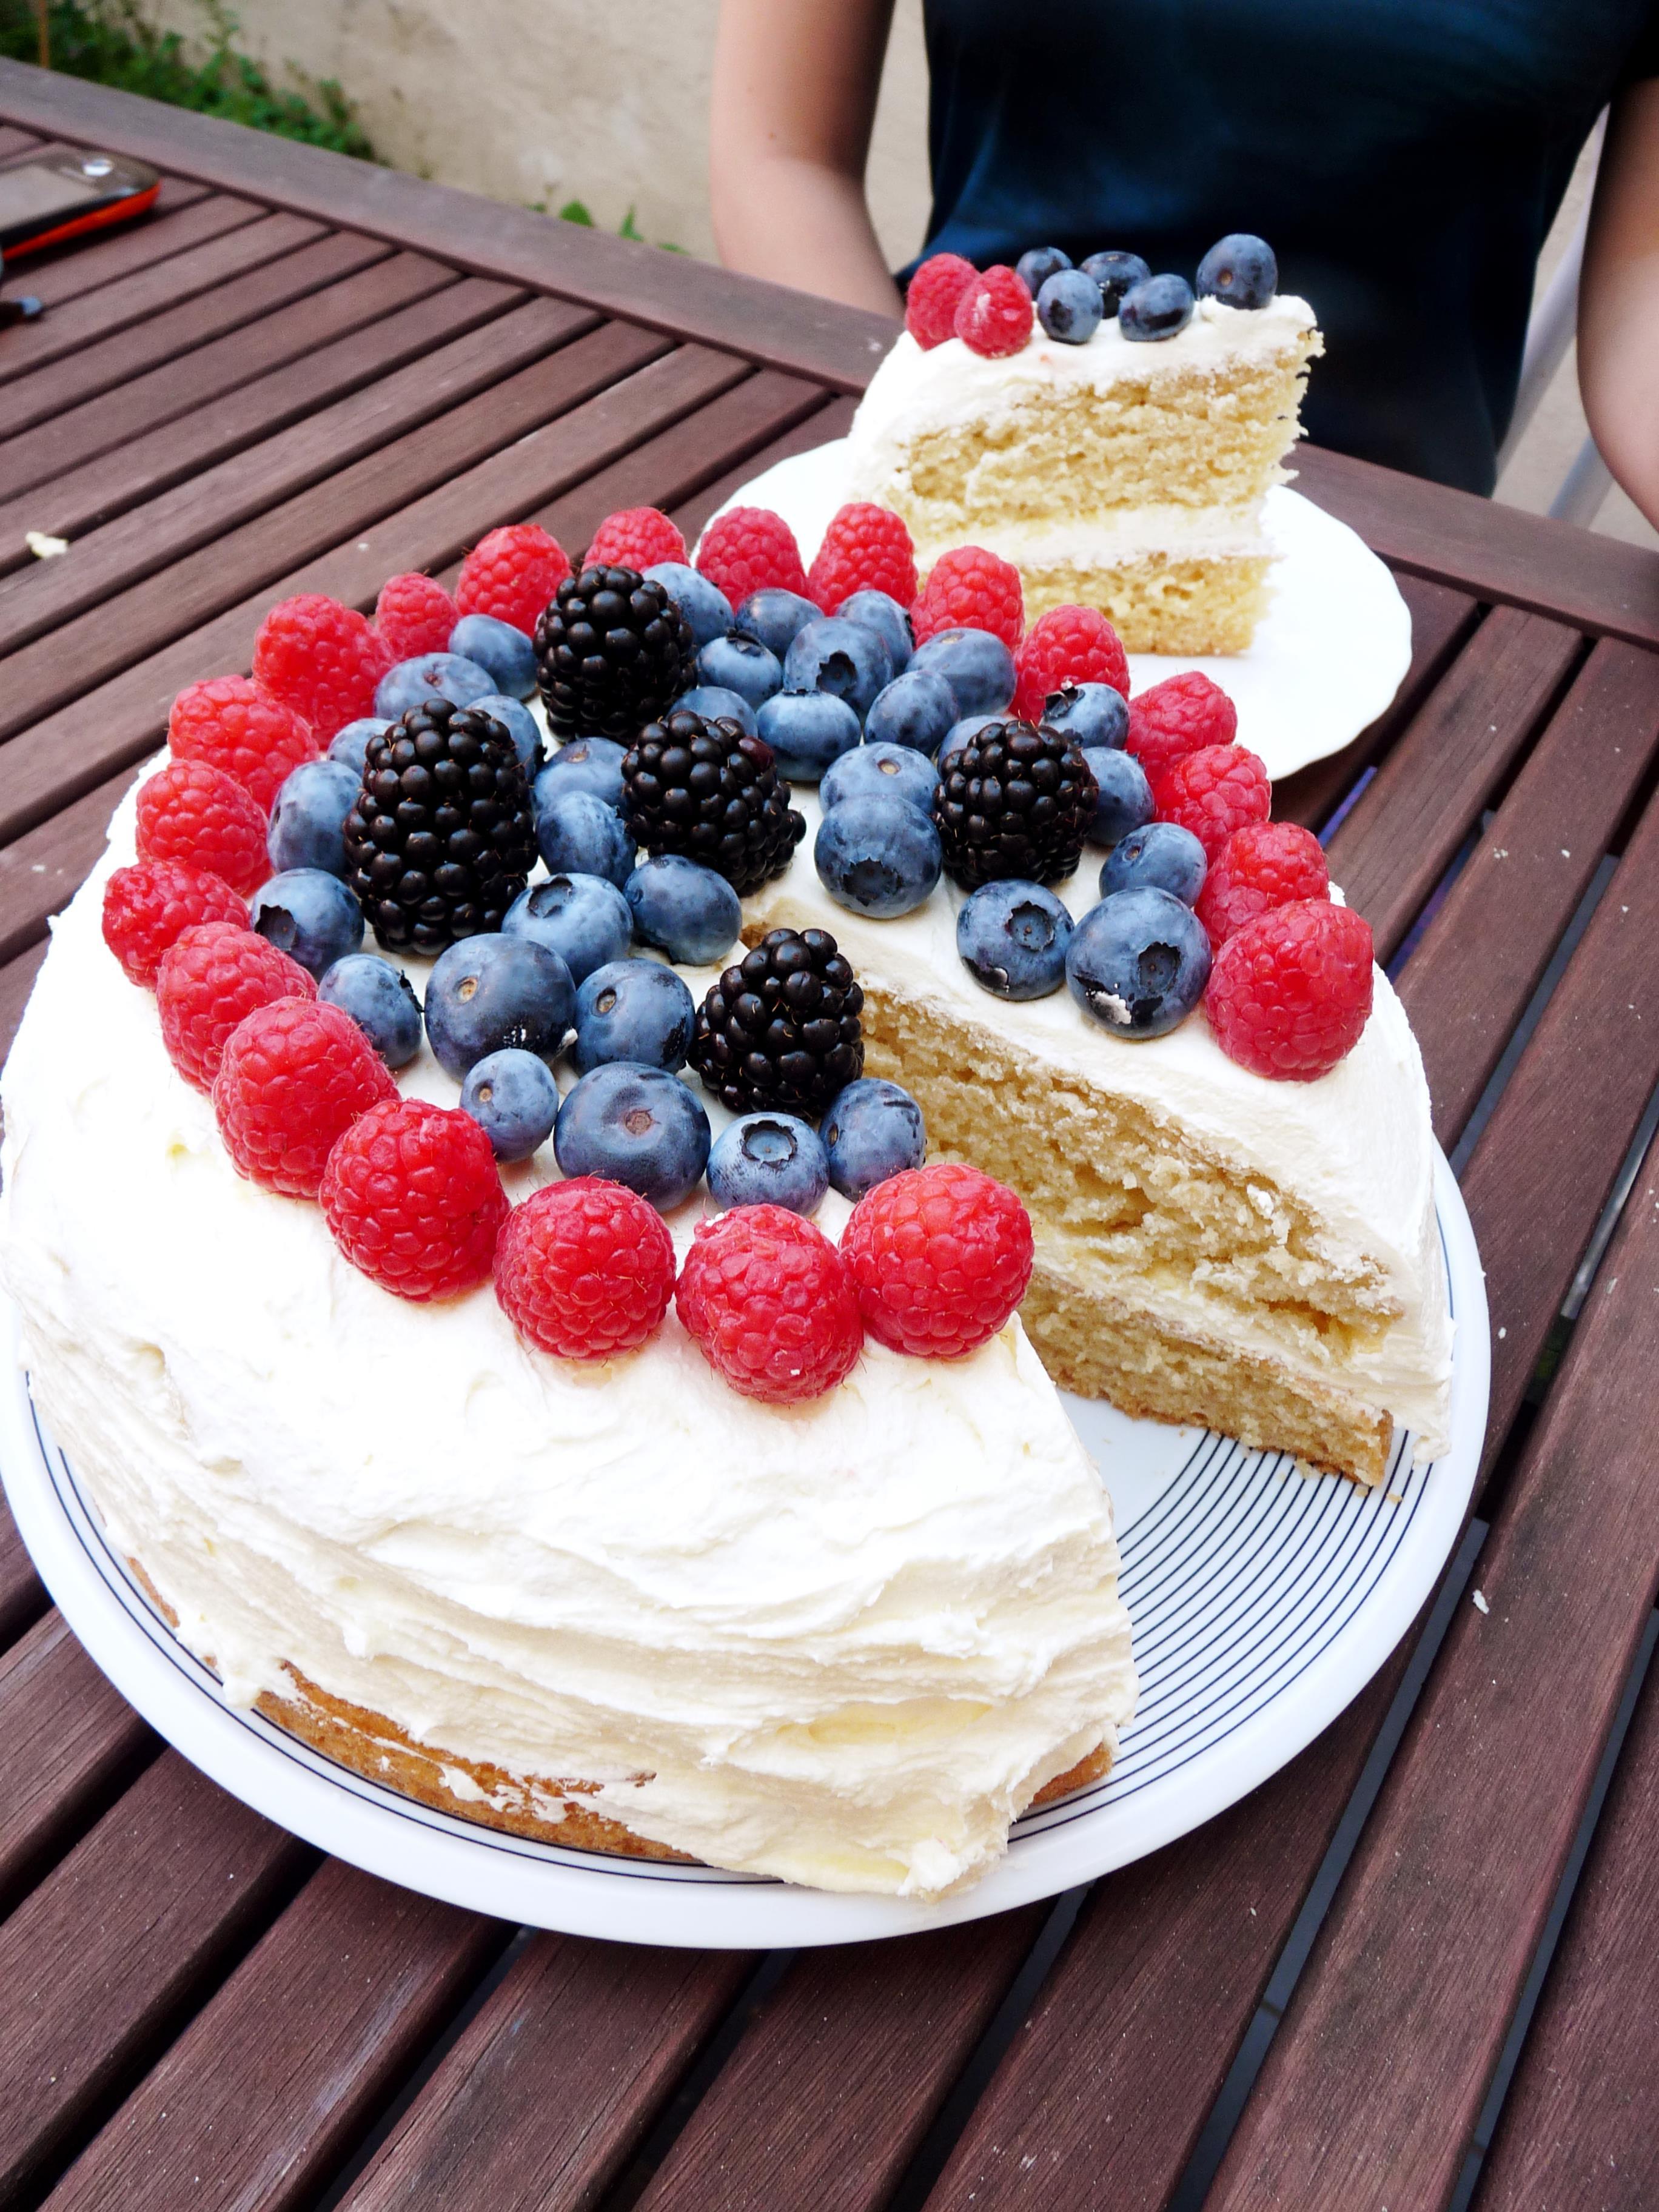 Best ideas about Vegan Birthday Cake Recipe . Save or Pin Vegan Birthday Cake – TofuParty Now.